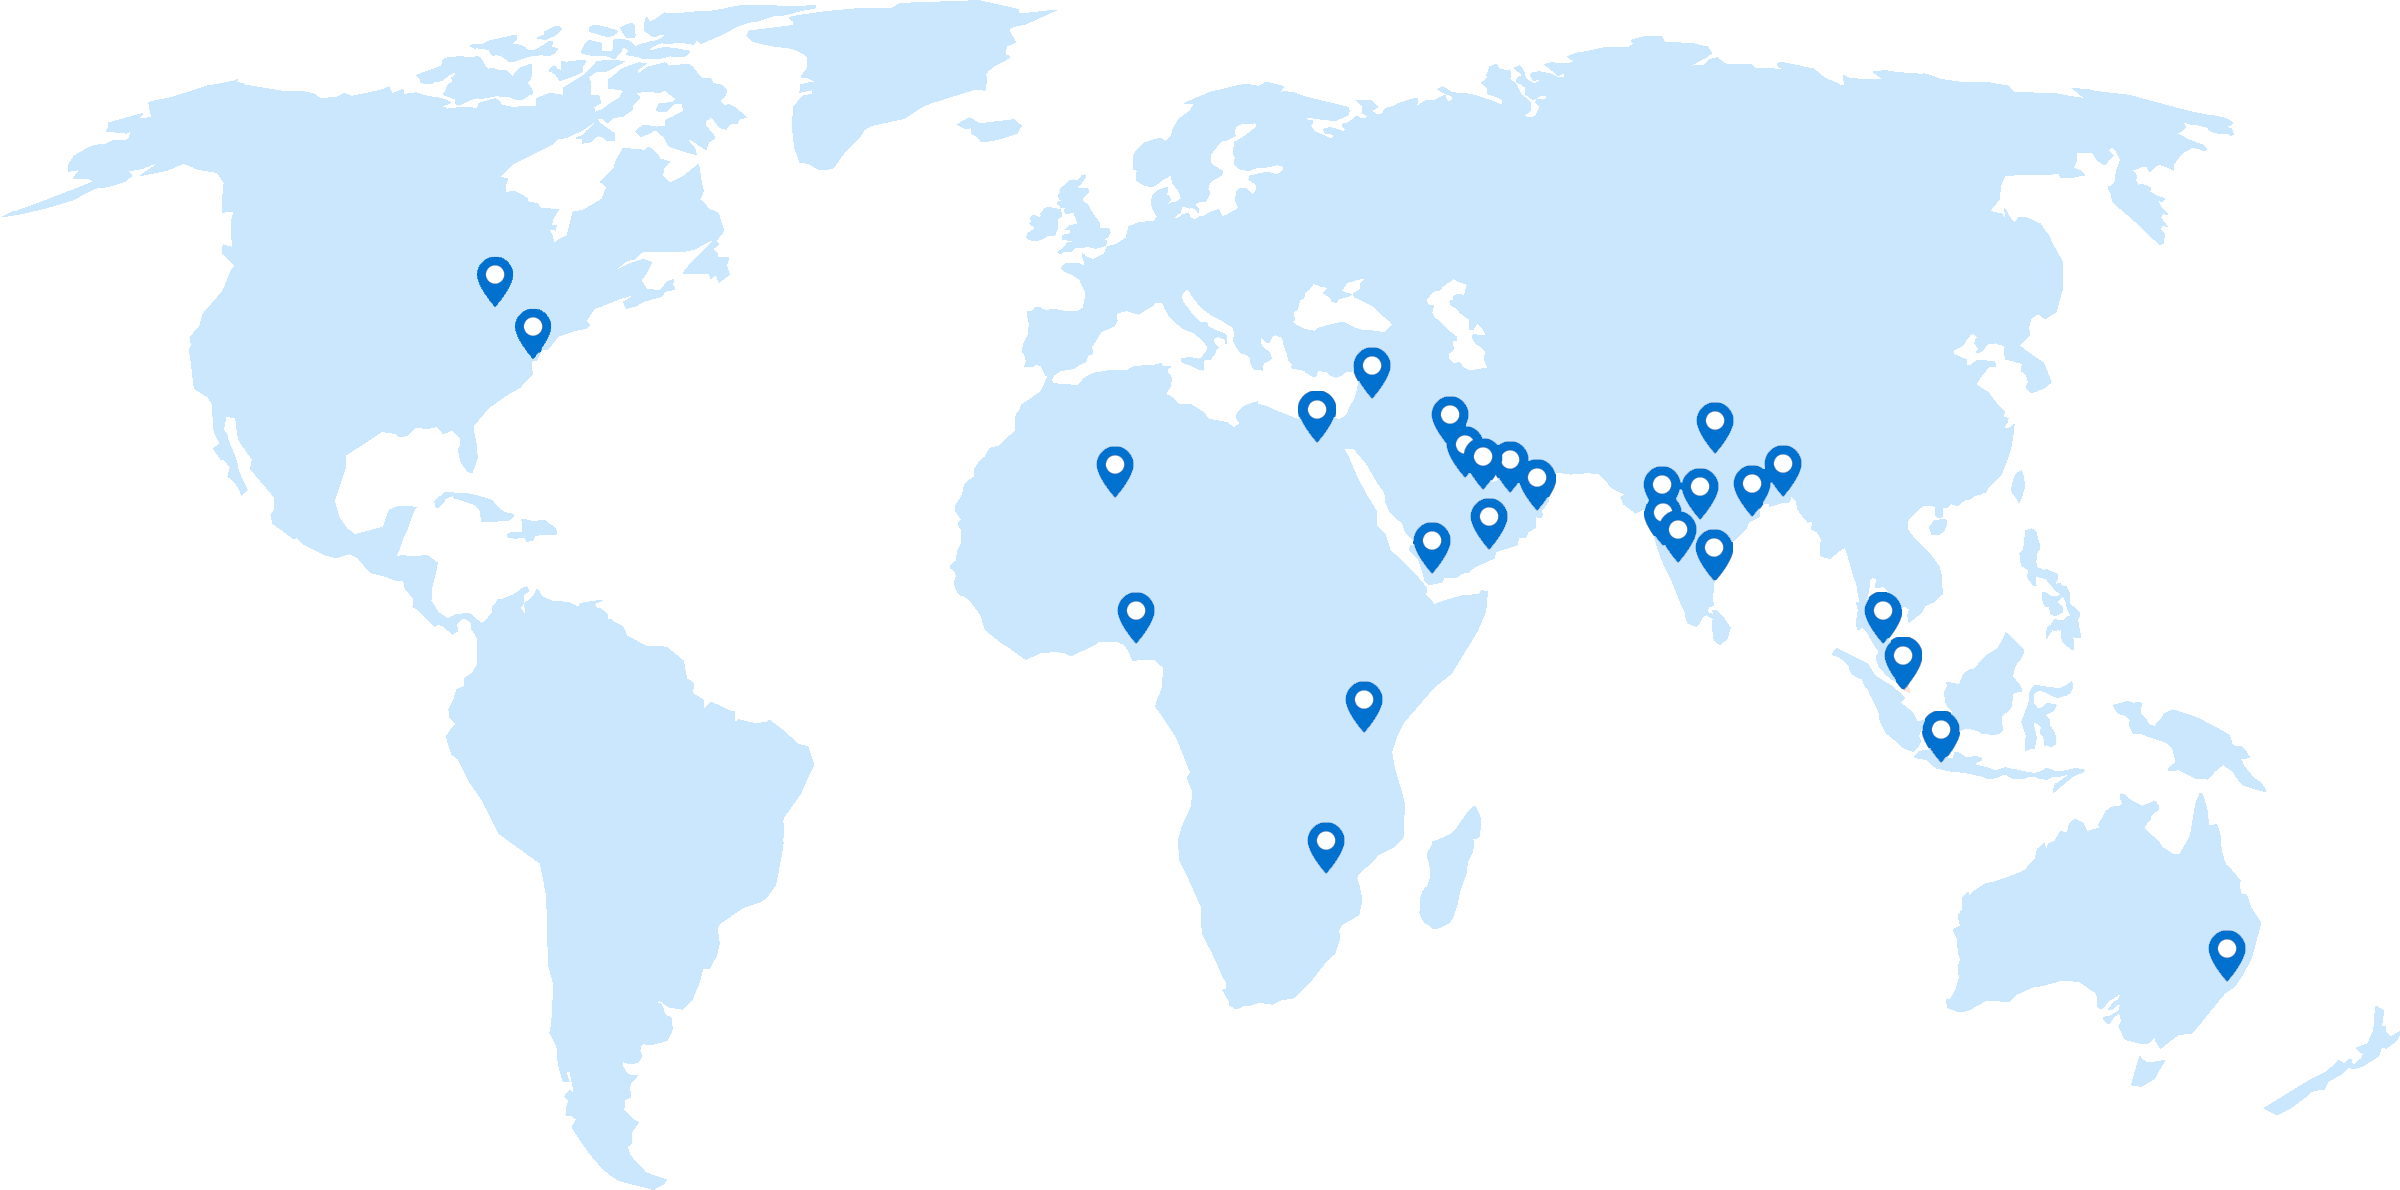 Transparent atlas holding the world clipart - World Map Clipart - World Map Simple Svg